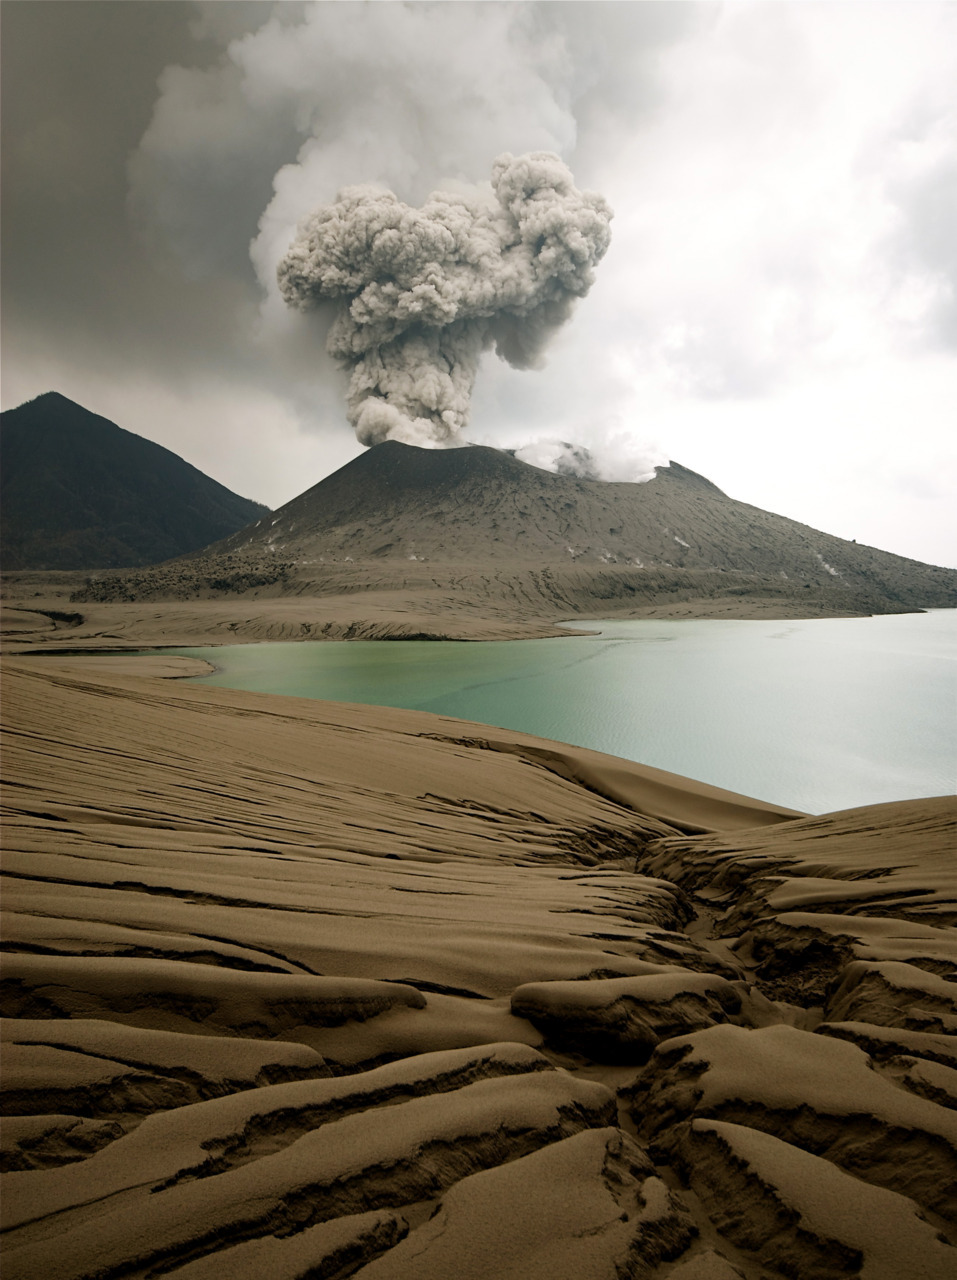 Vulkani - Page 2 Tumblr_luhphvPZJY1ql9wl2o1_r1_1280